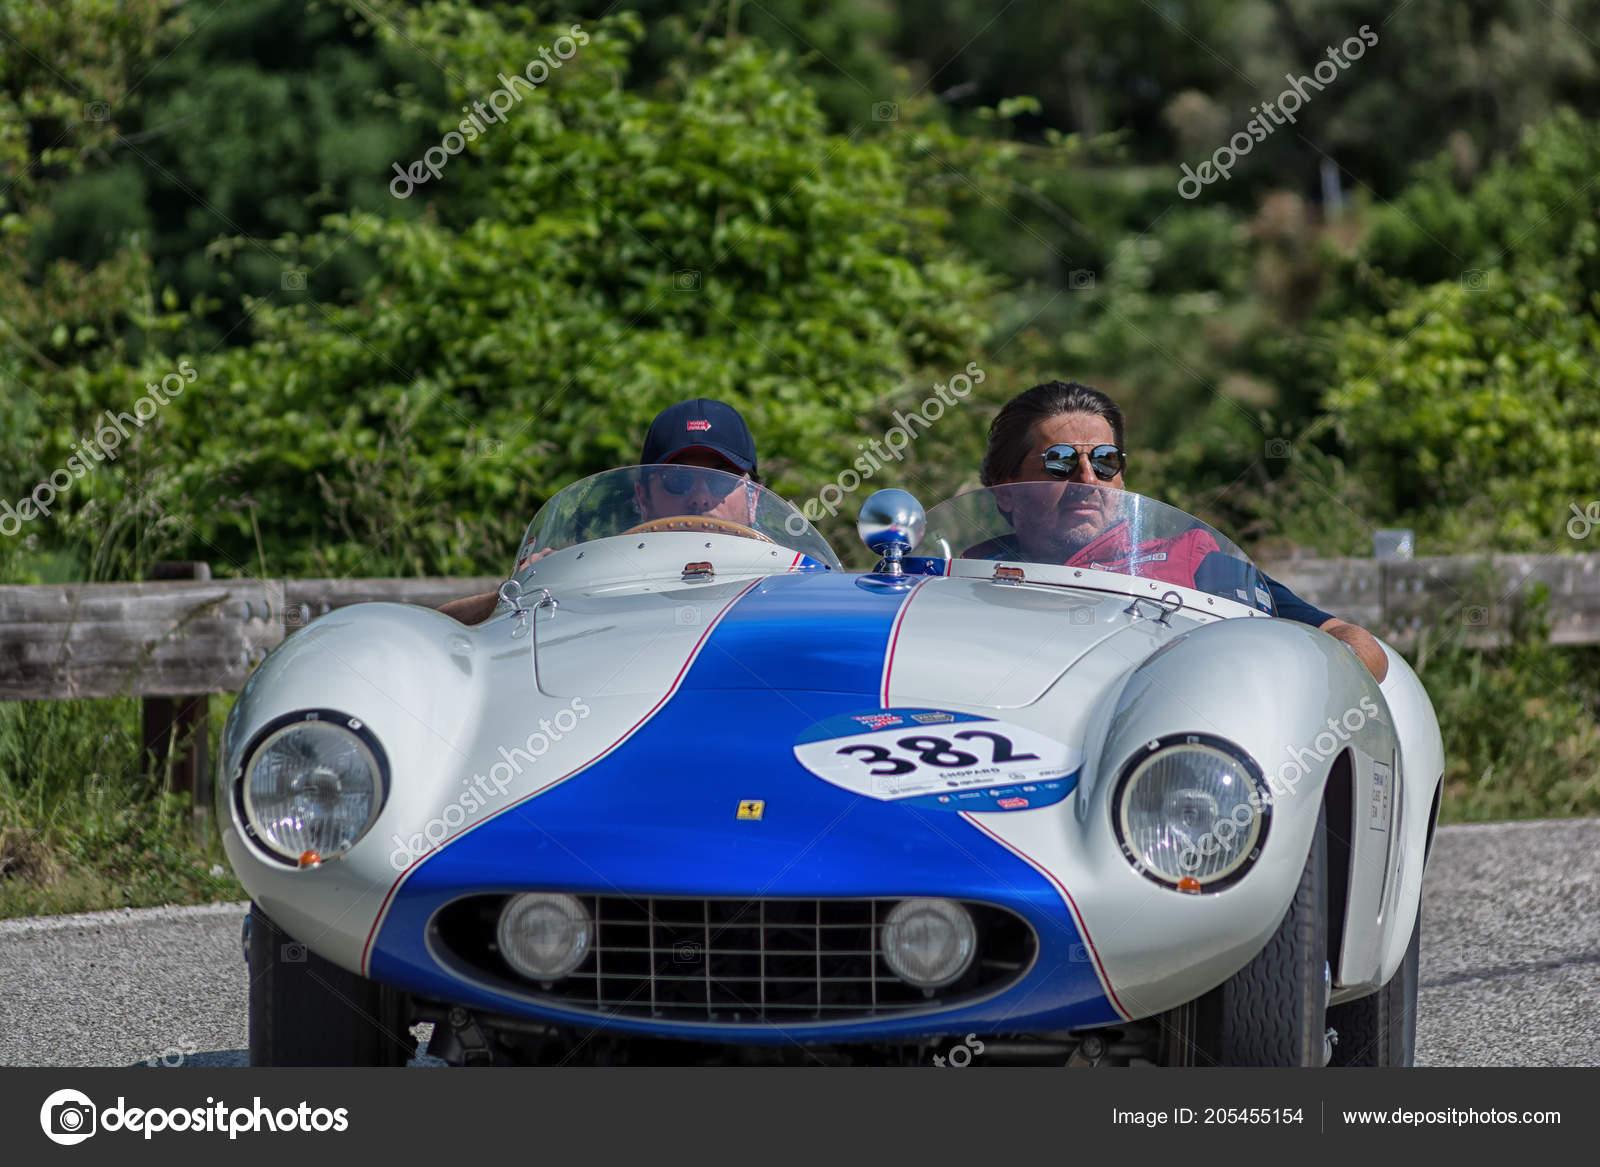 Pesaro Colle San Bartolo Italy May 2018 Ferrari 750 Monza Stock Editorial Photo C Massimocampa 205455154